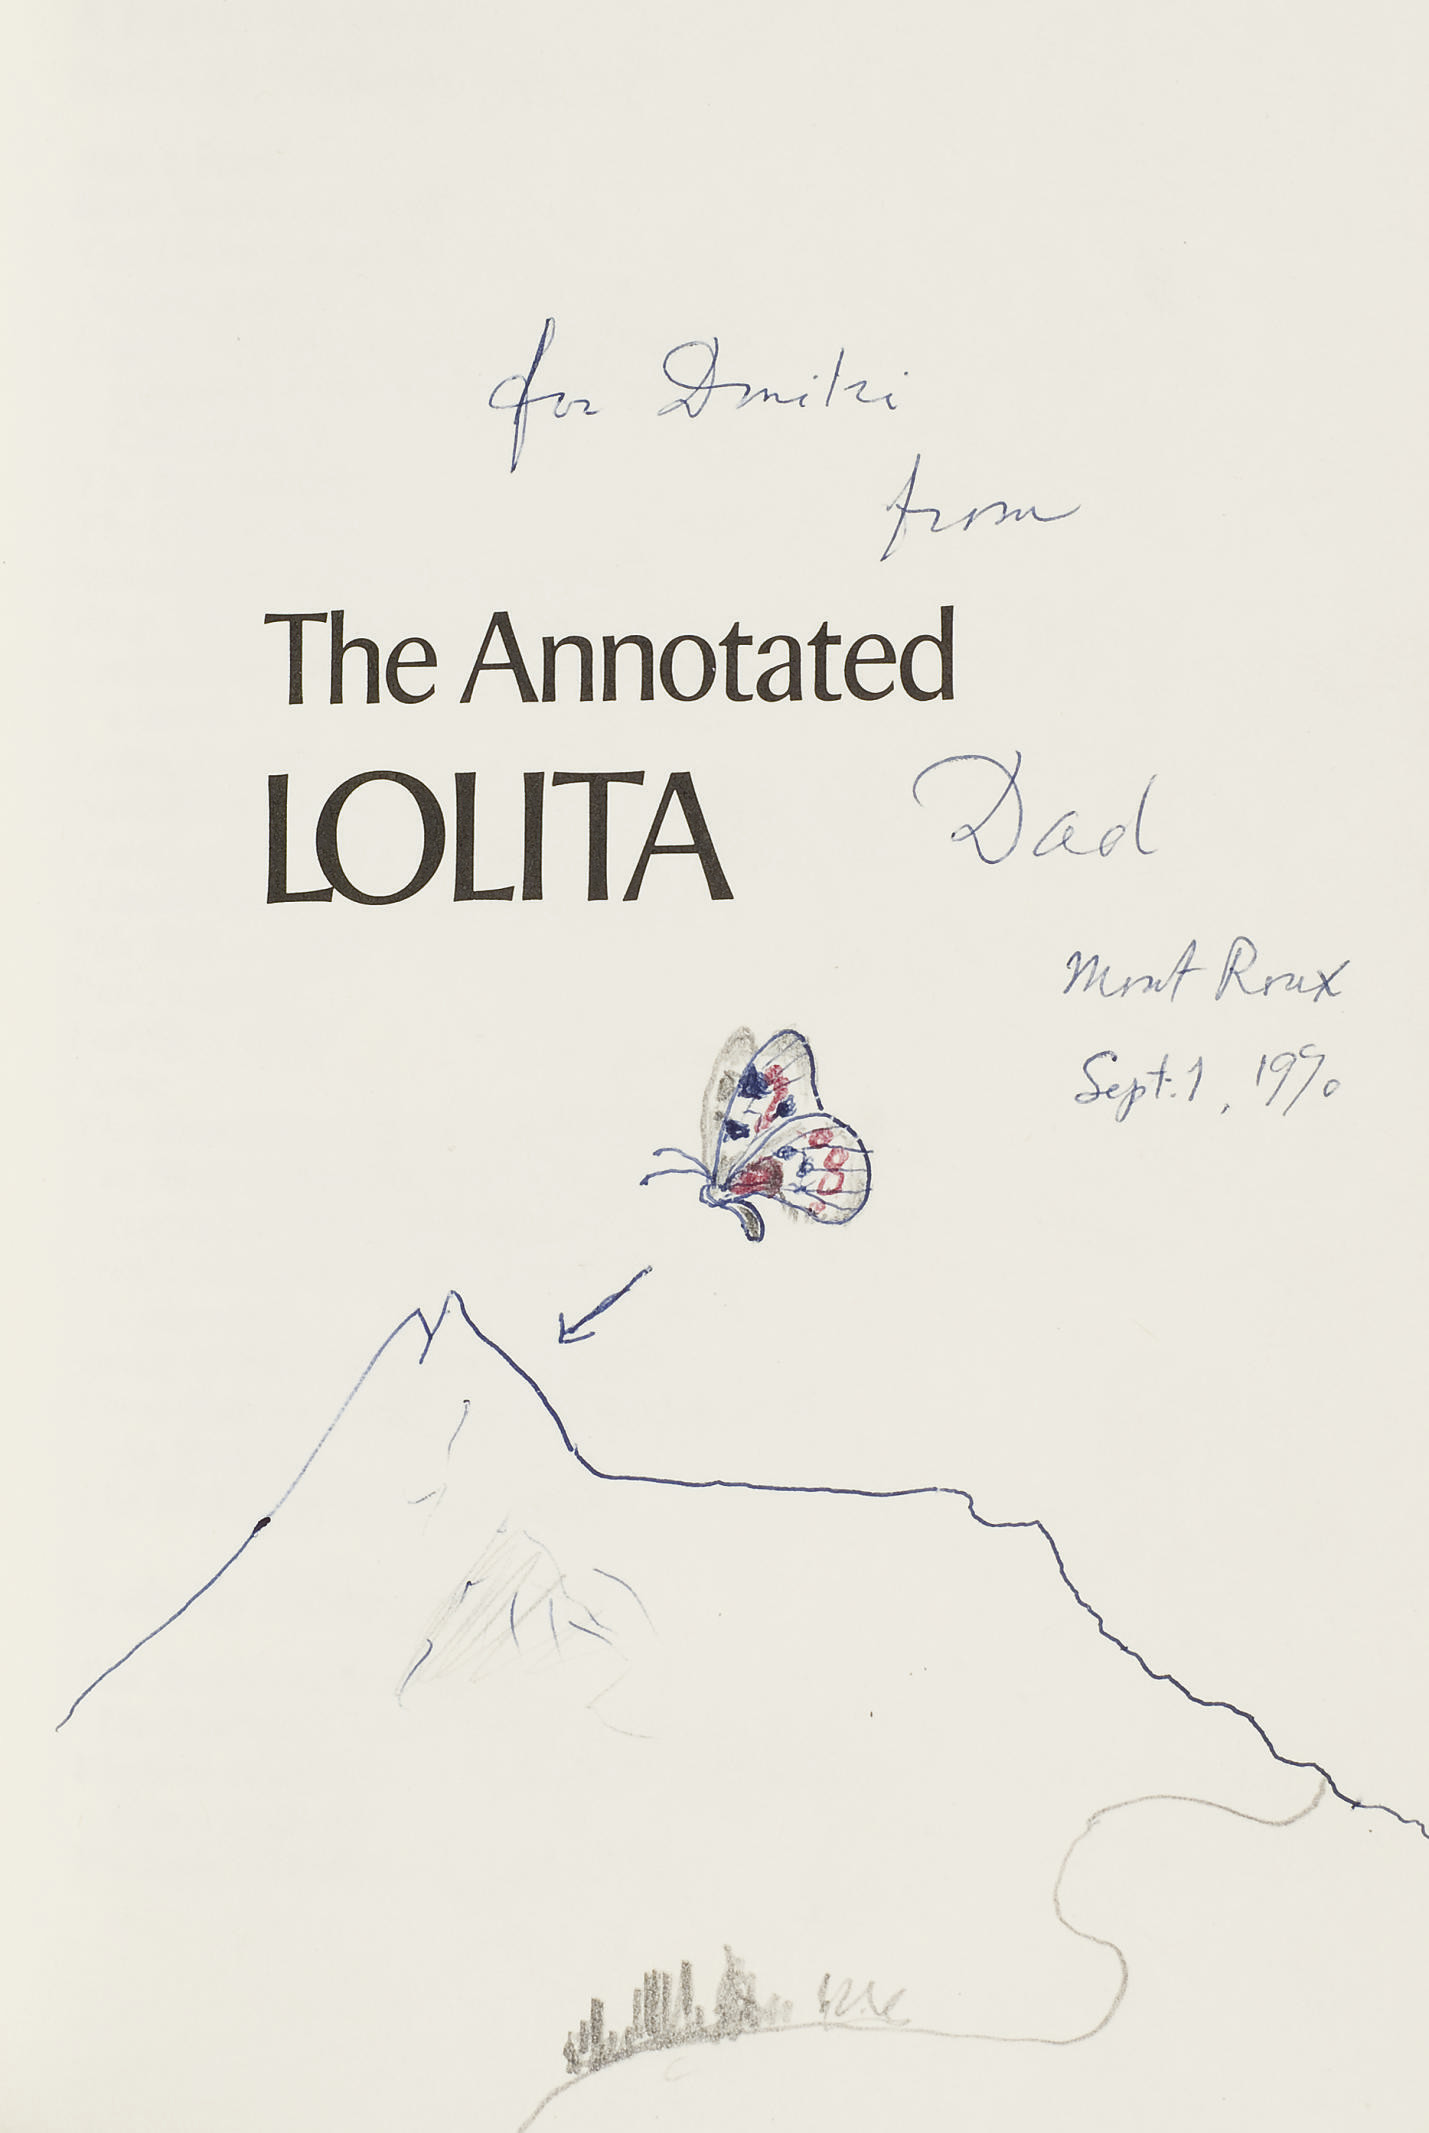 NABOKOV, Vladimir (1899-1977). The Annotated Lolita. New York, Toronto: McGraw-Hill Book Company, [1970].